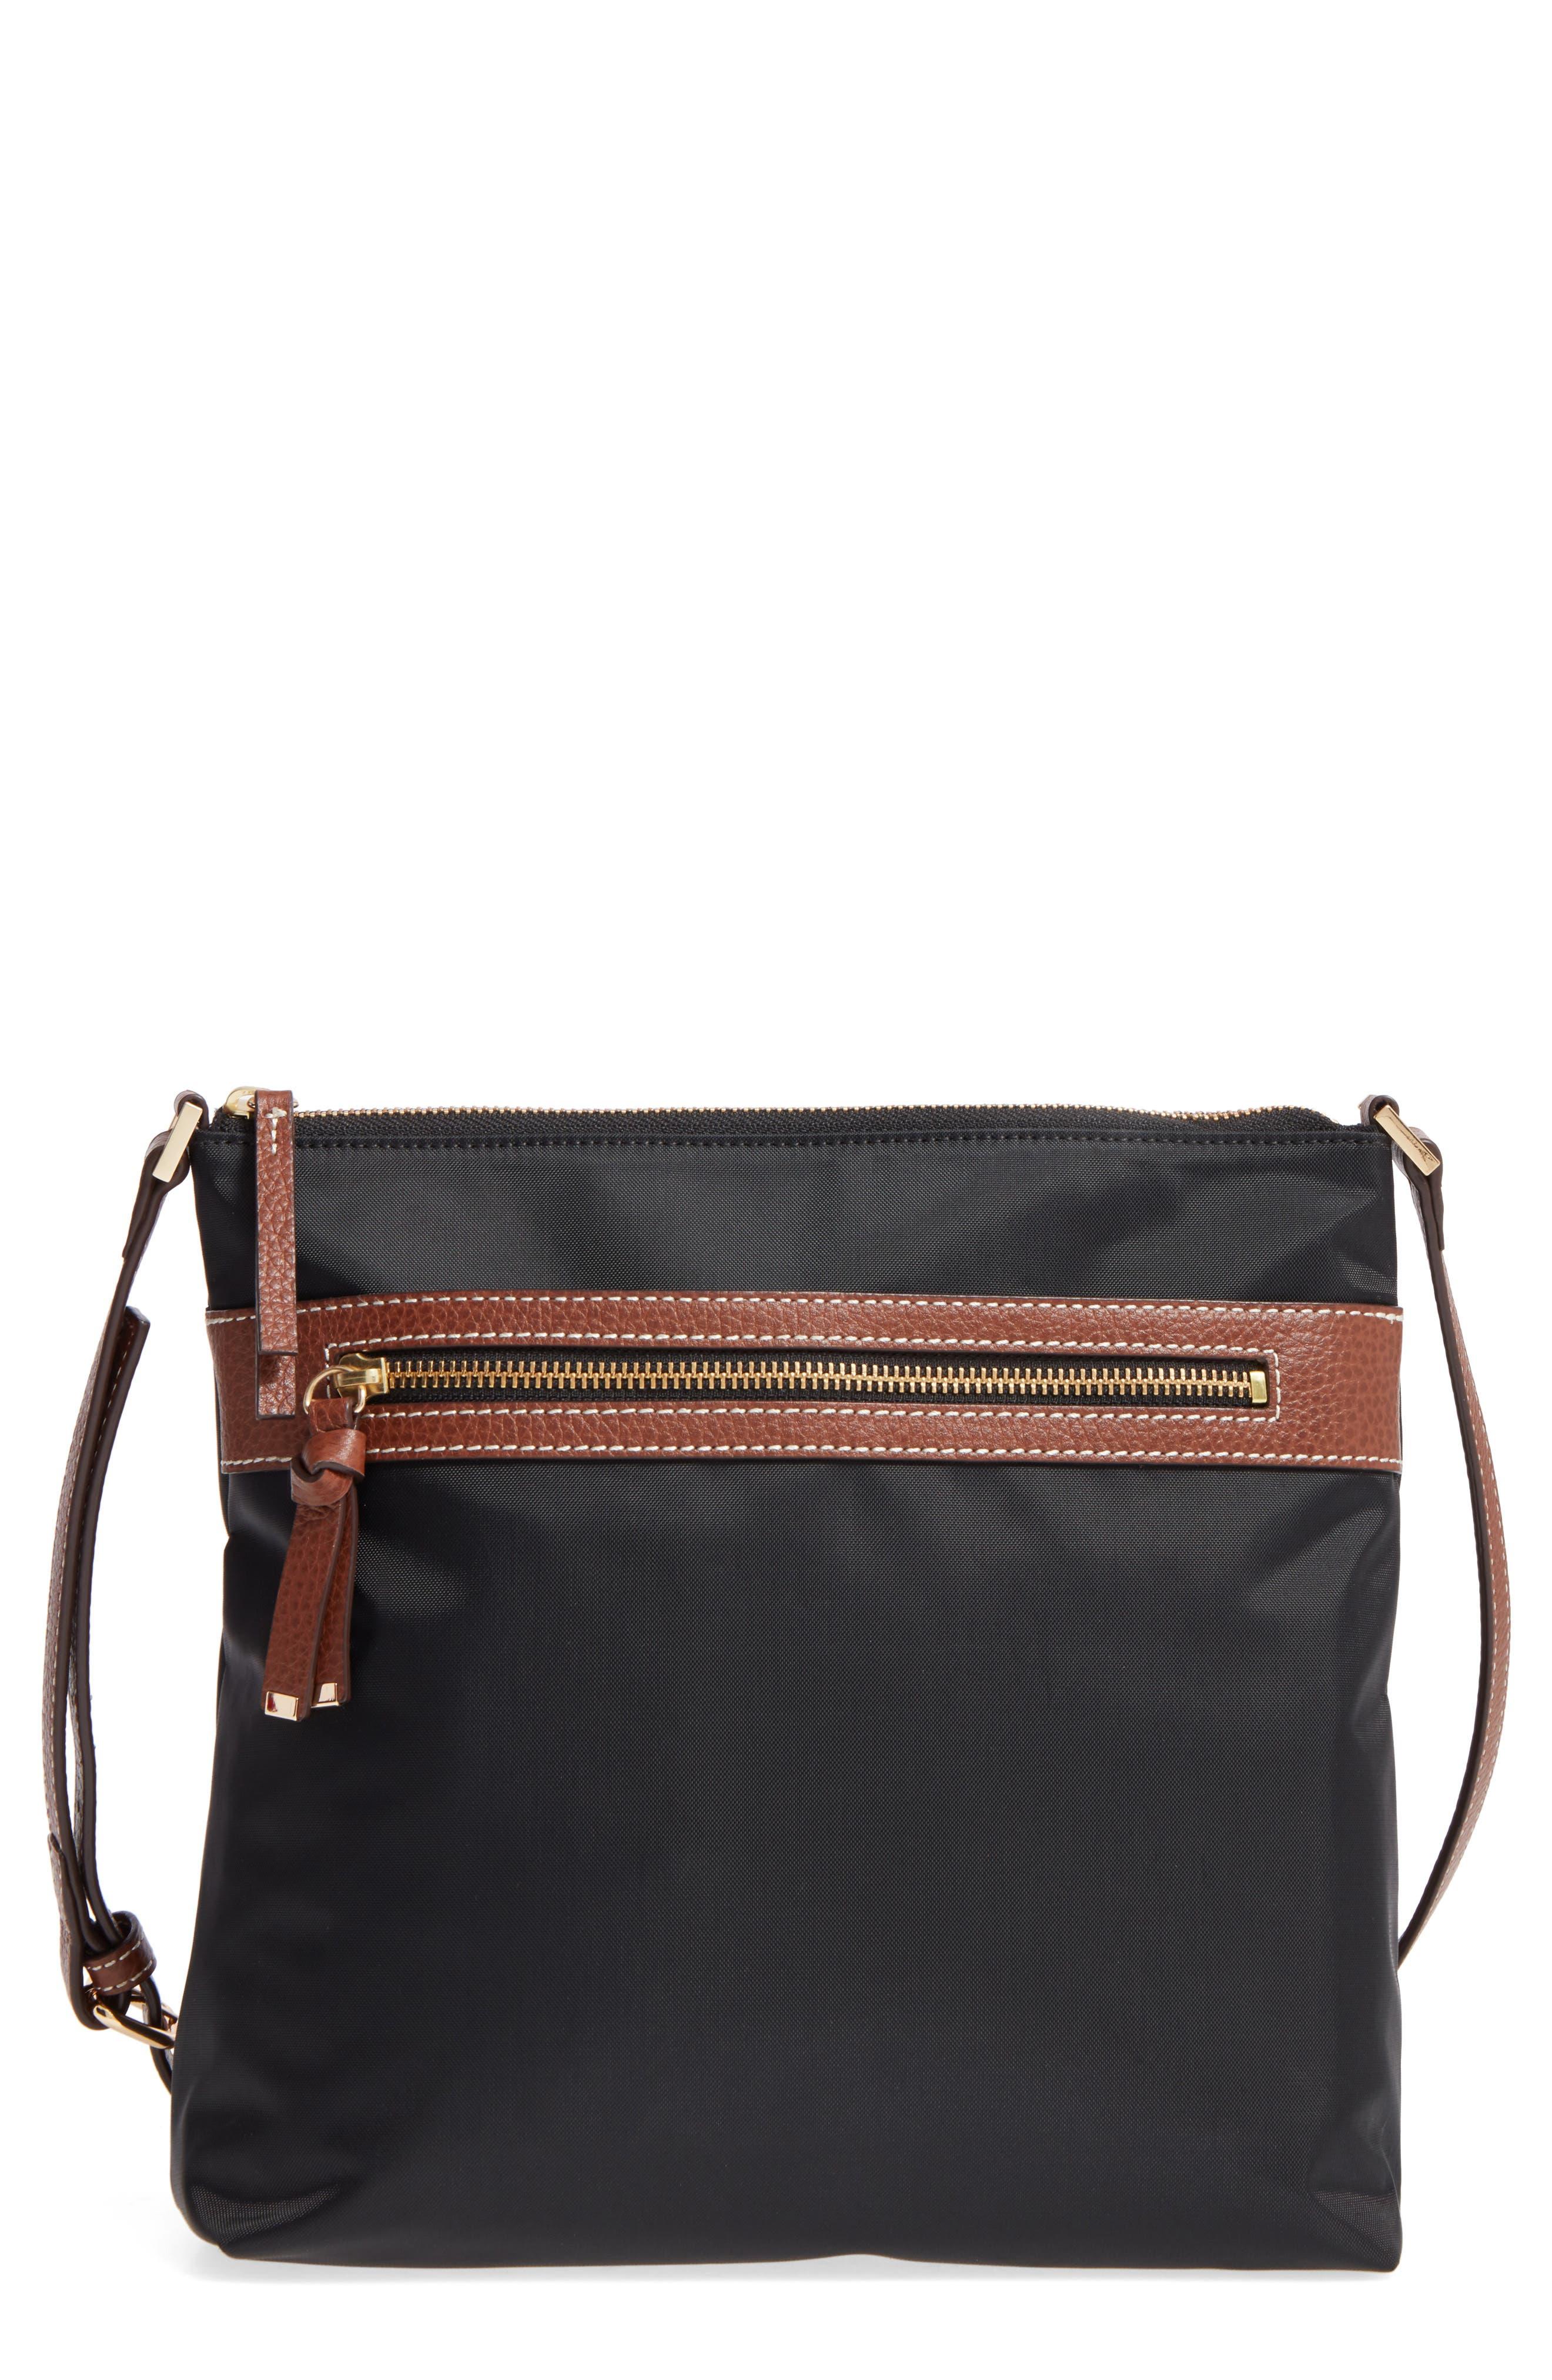 Main Image - Halogen Nylon Crossbody Bag